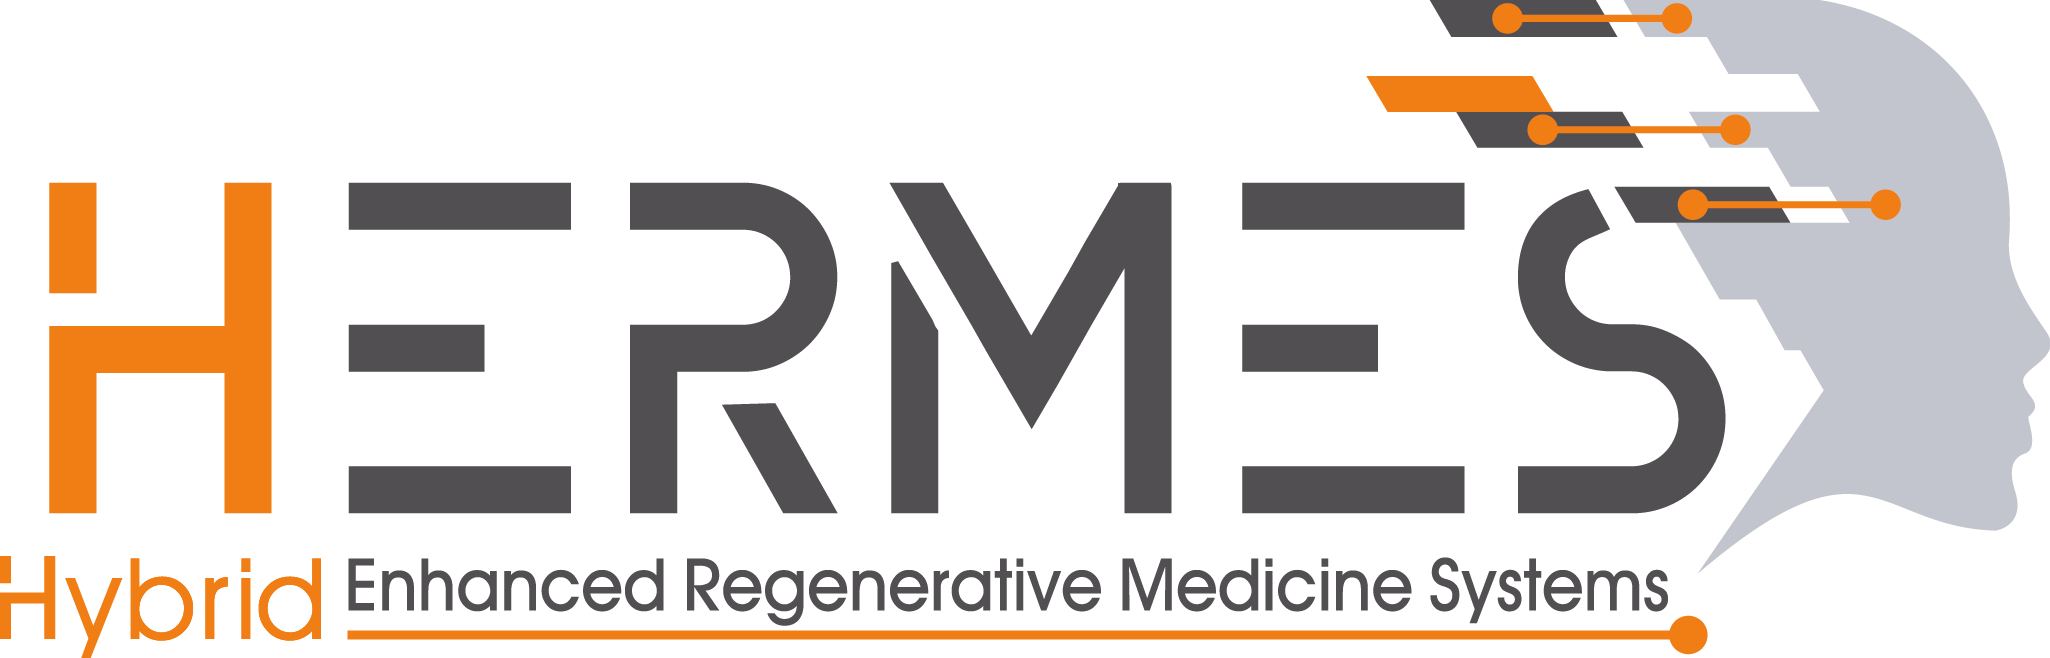 HERMES project, our involvement in regenerative medicine | Grupo de